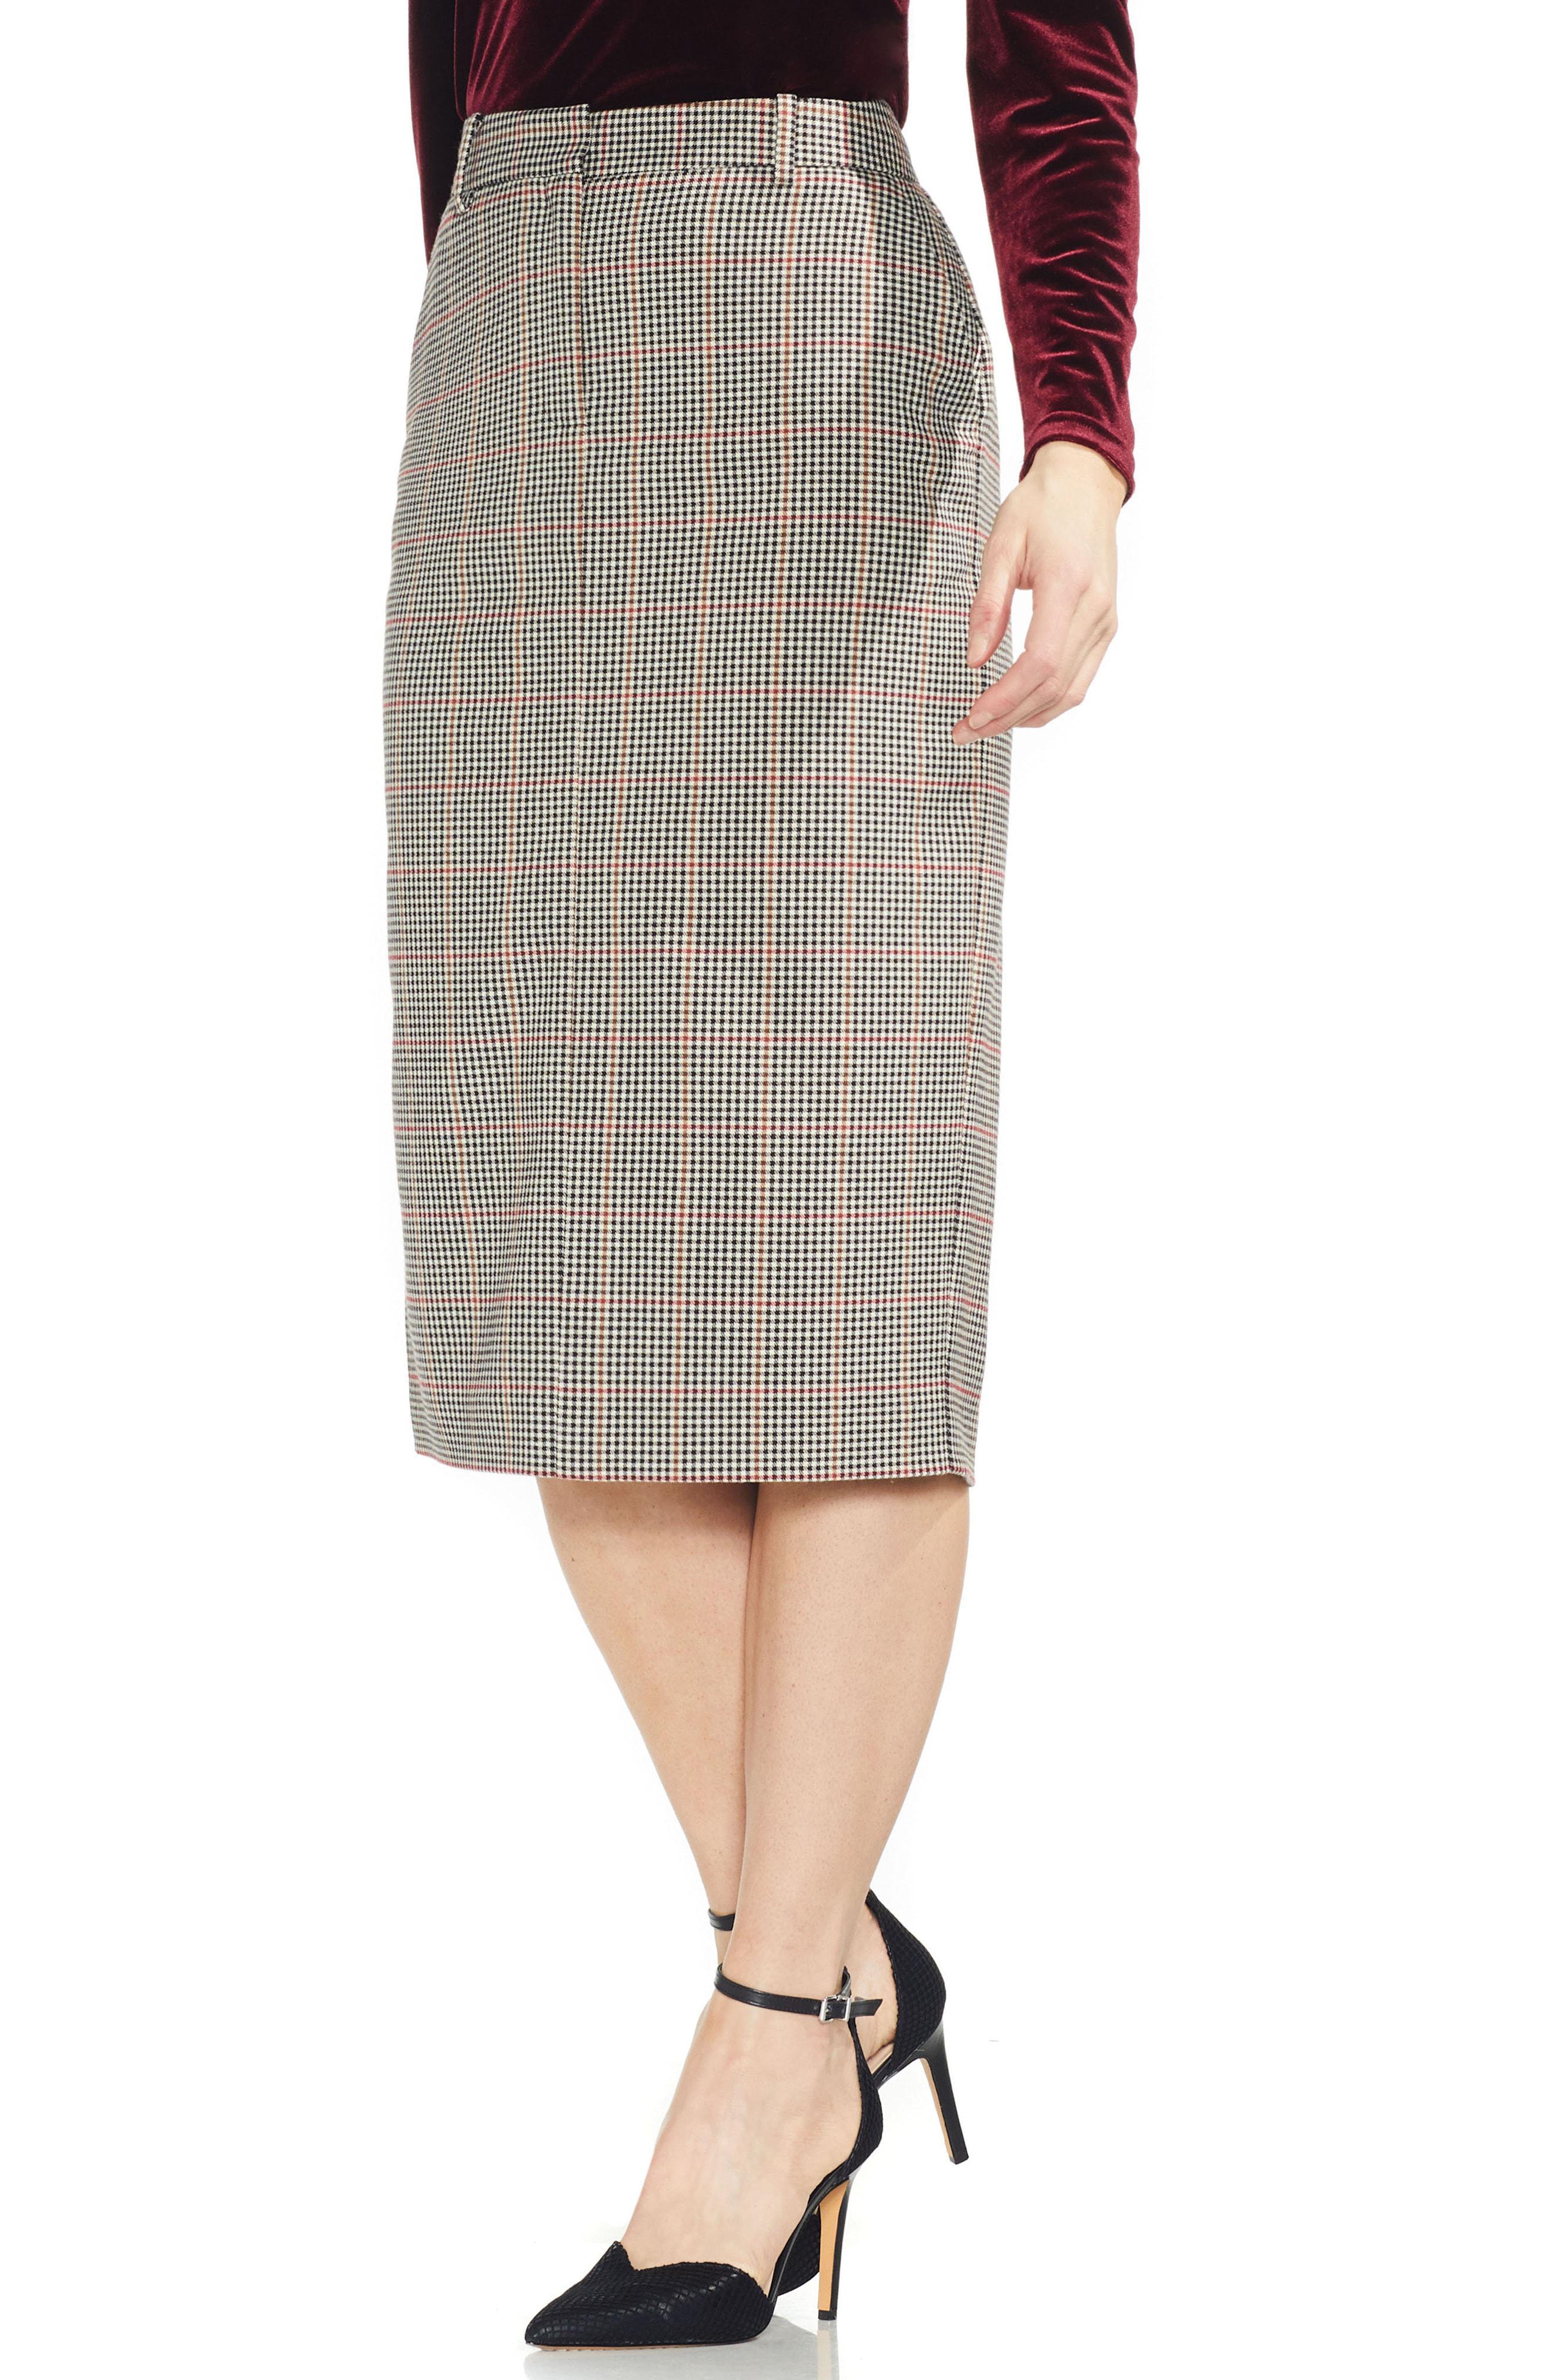 e83600af8b Vince Camuto Menswear Plaid Midi Length Pencil Skirt in Black - Lyst